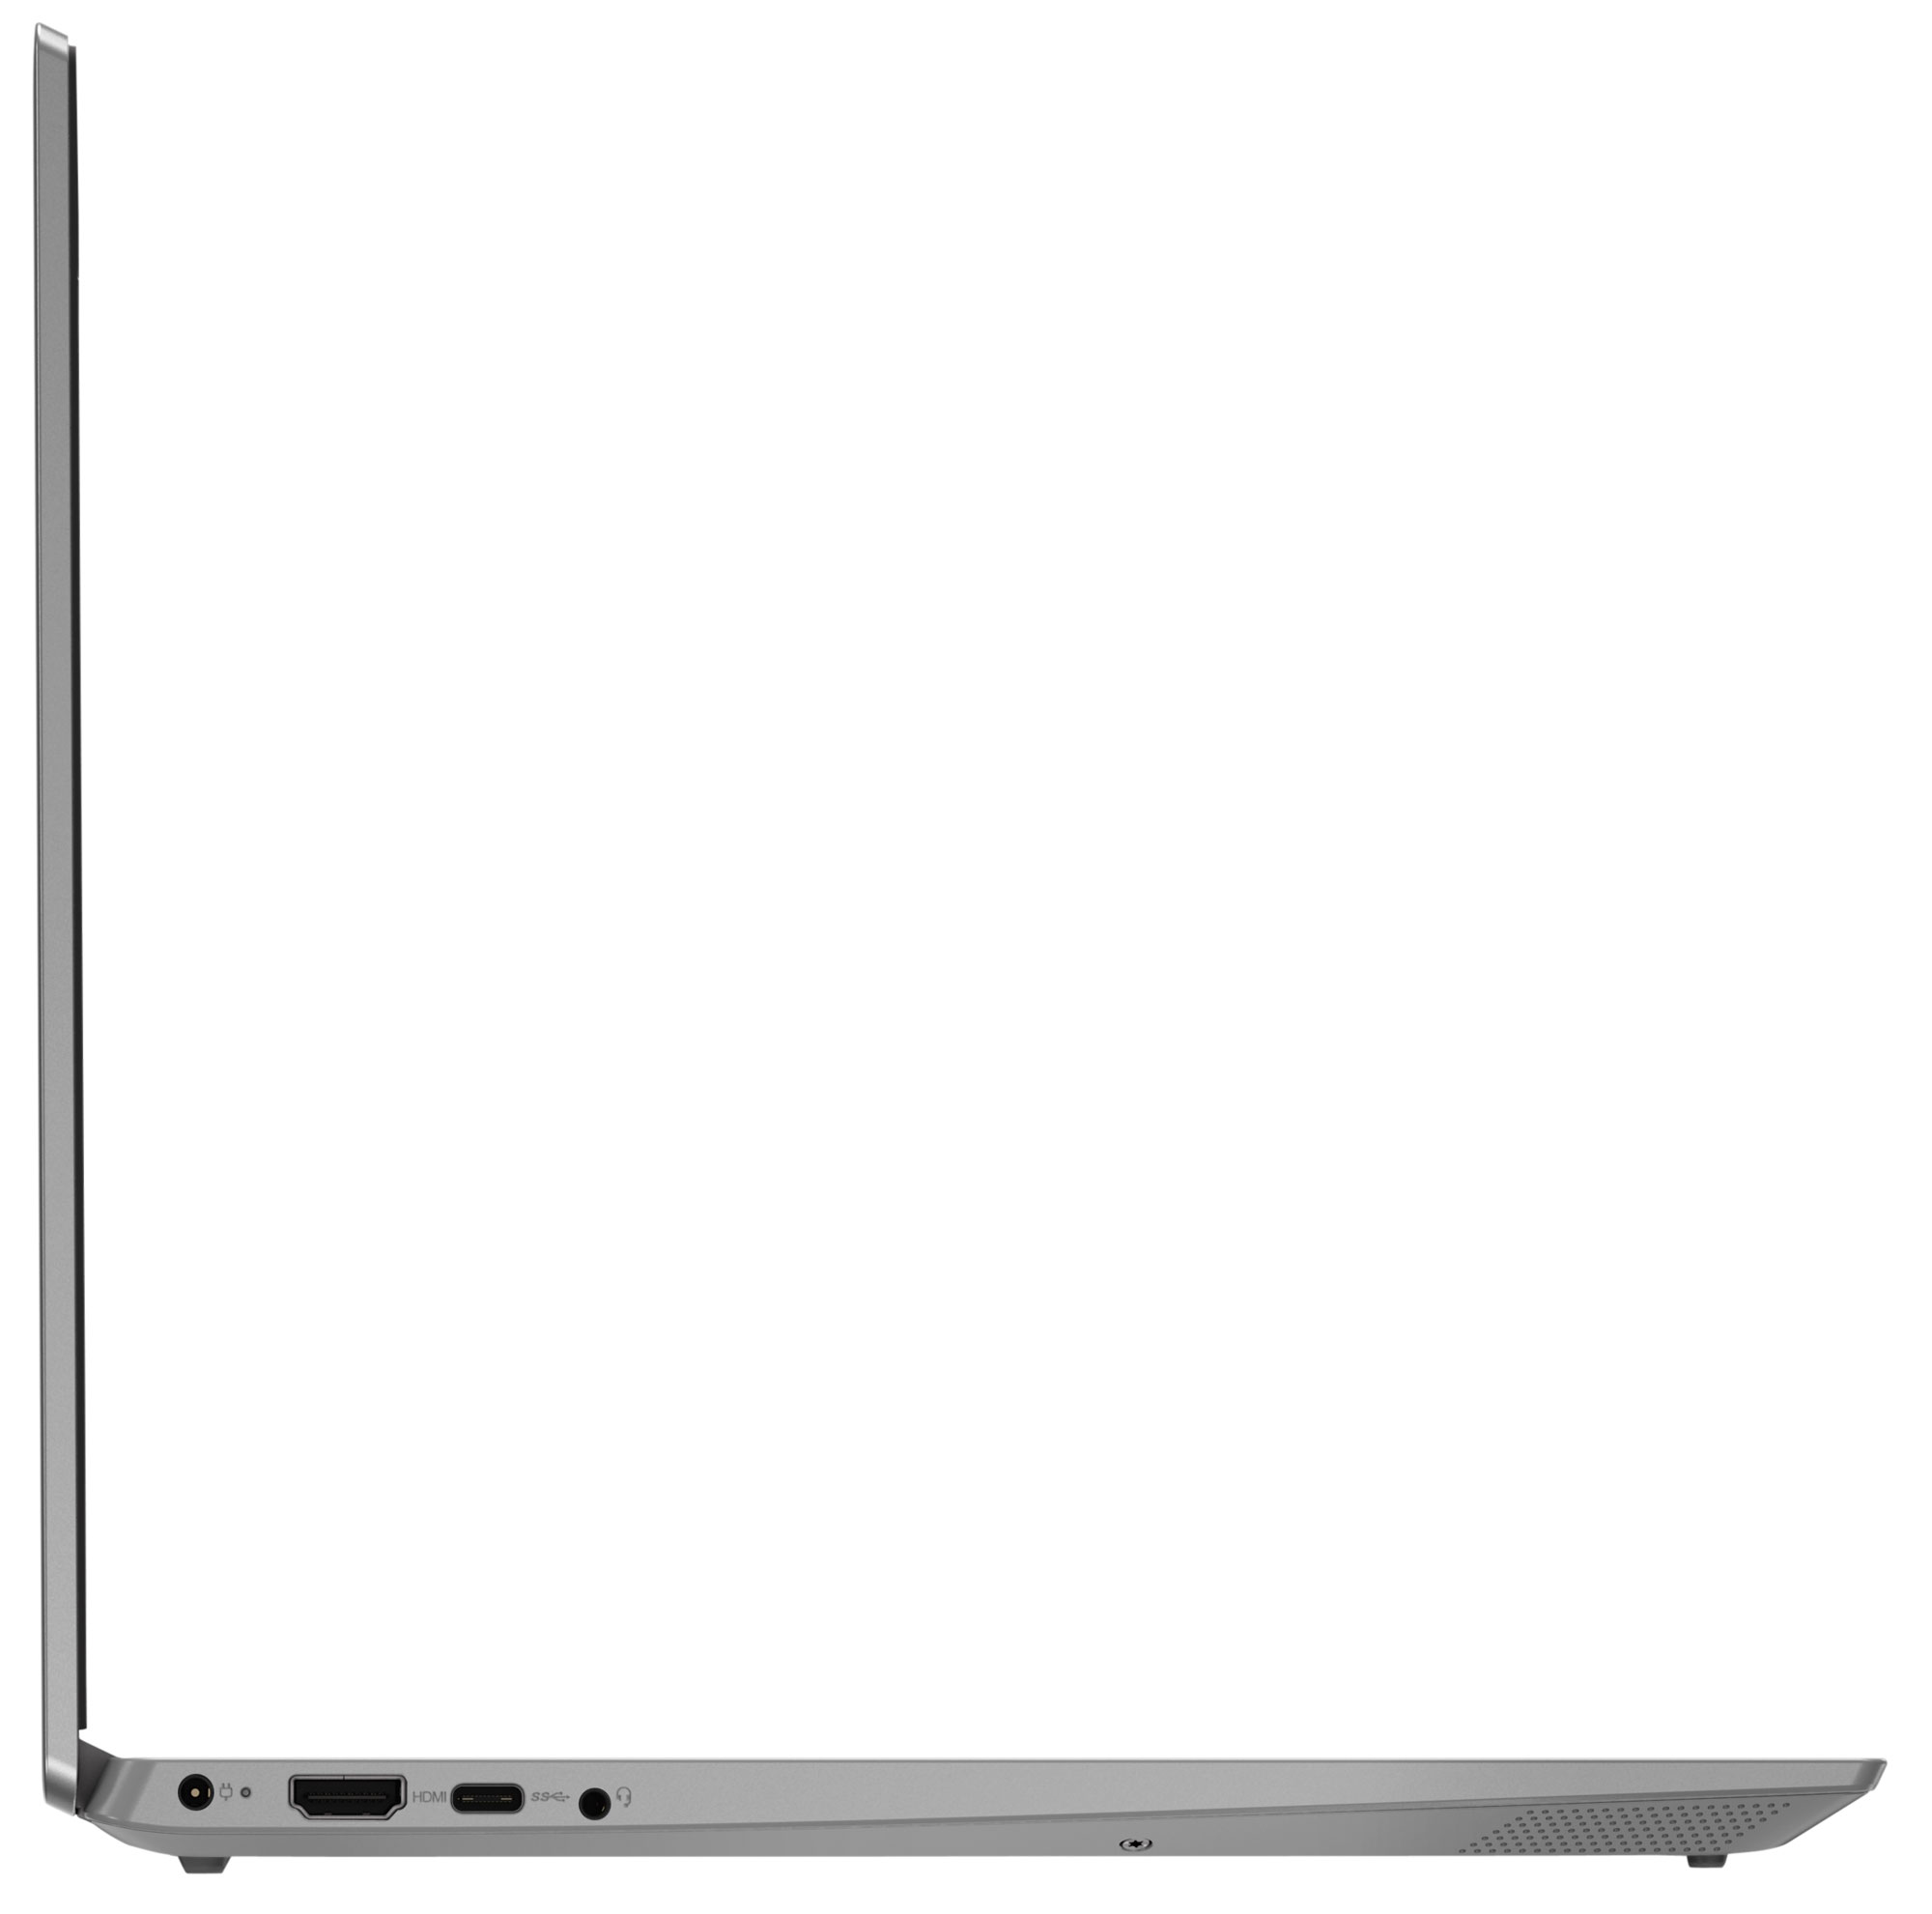 Фото  Ноутбук Lenovo ideapad S340-15IWL Platinum Grey (81N800YQRE)